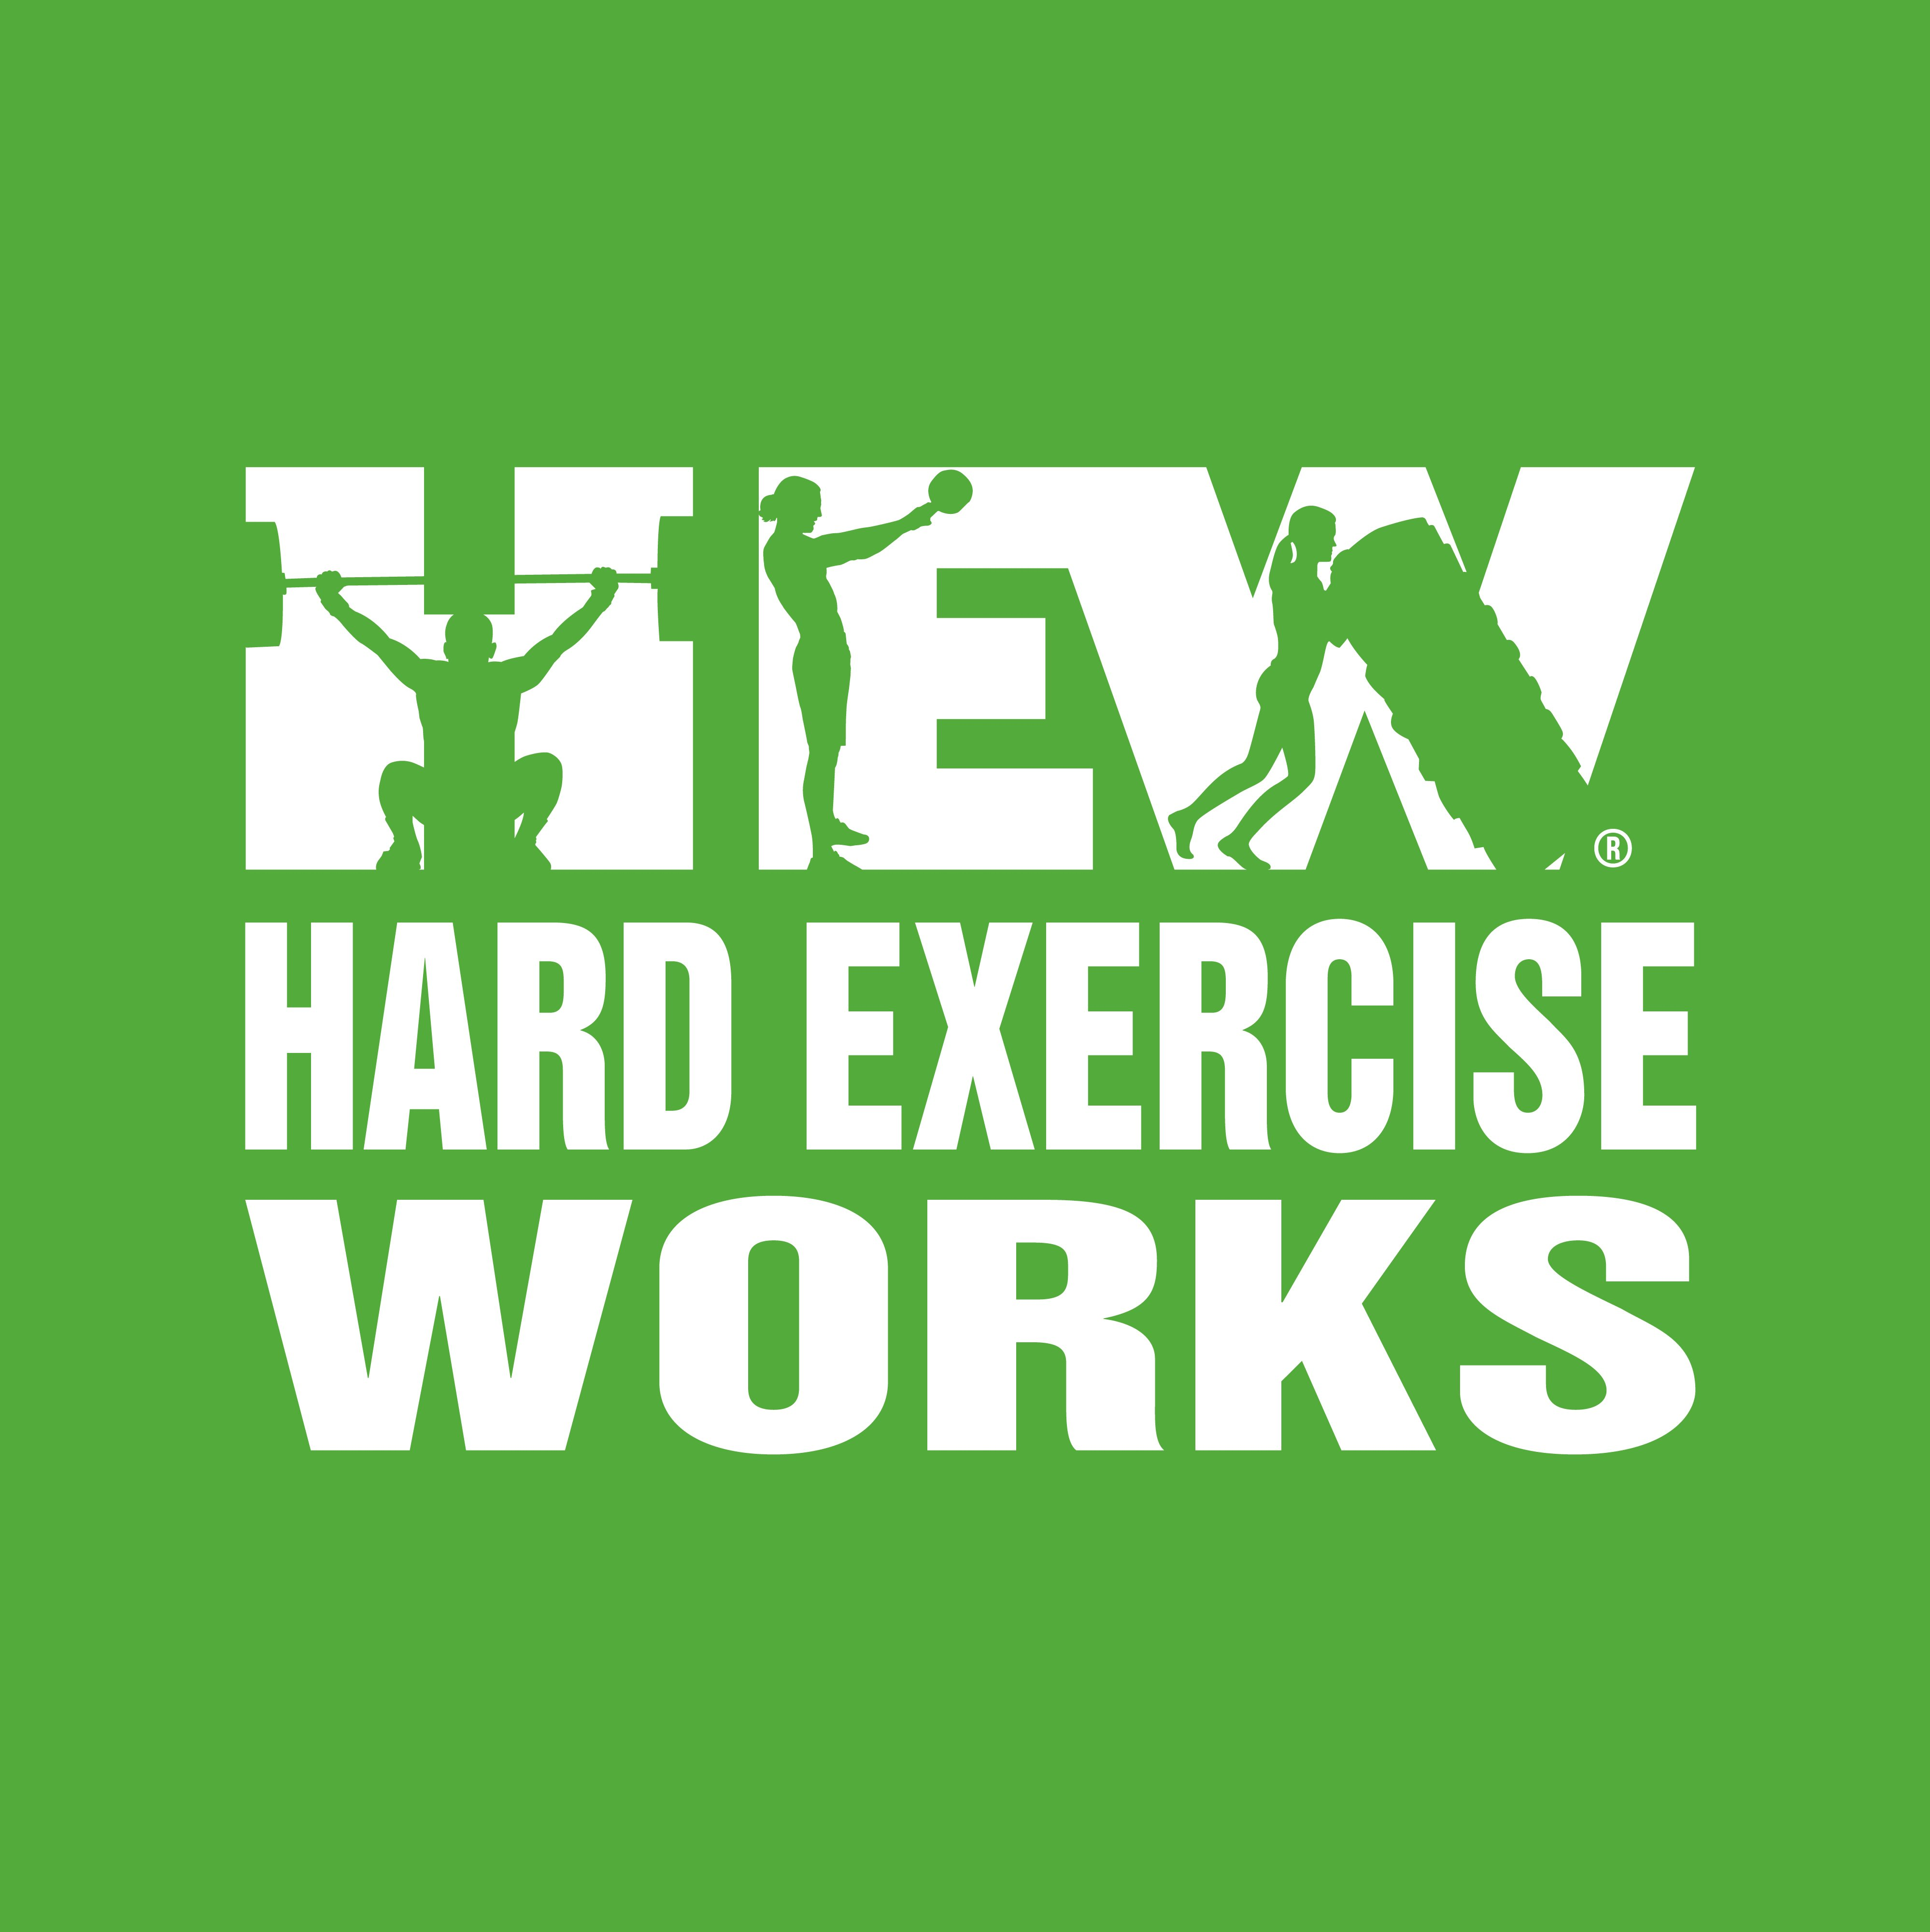 HEW Fitness